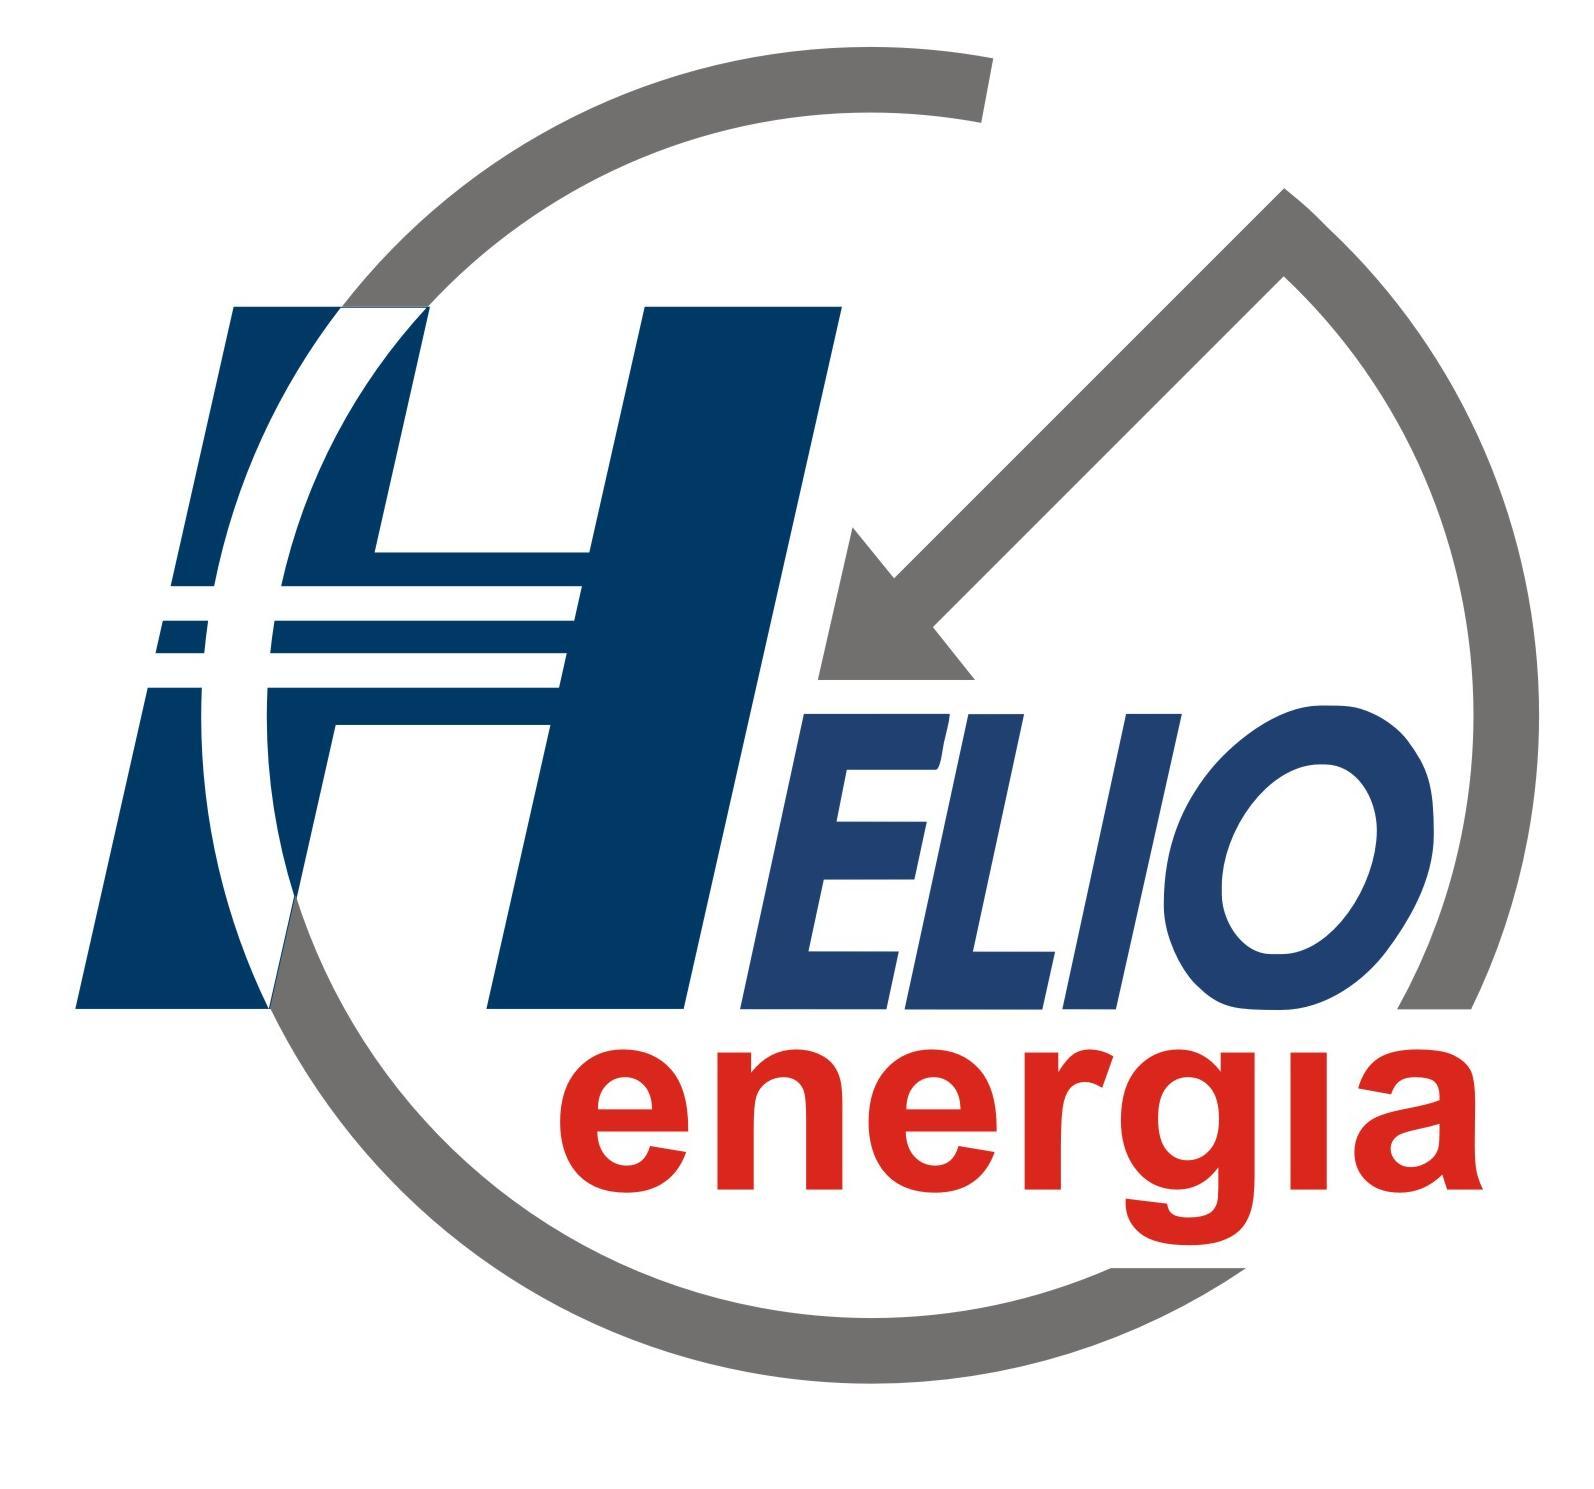 HelioEnergia_logotyp_offical